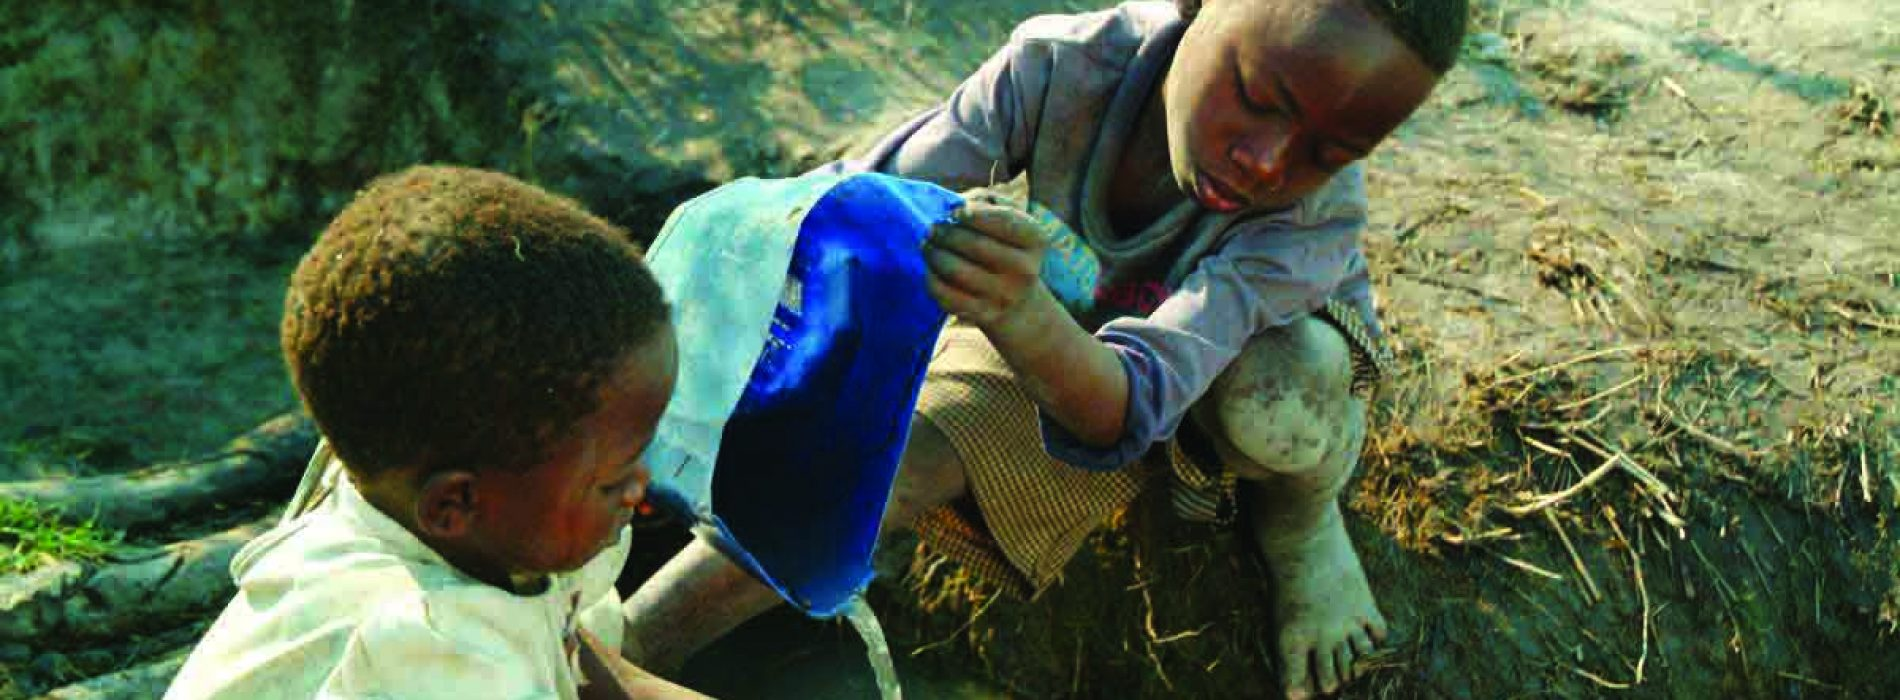 Epidemics and social change